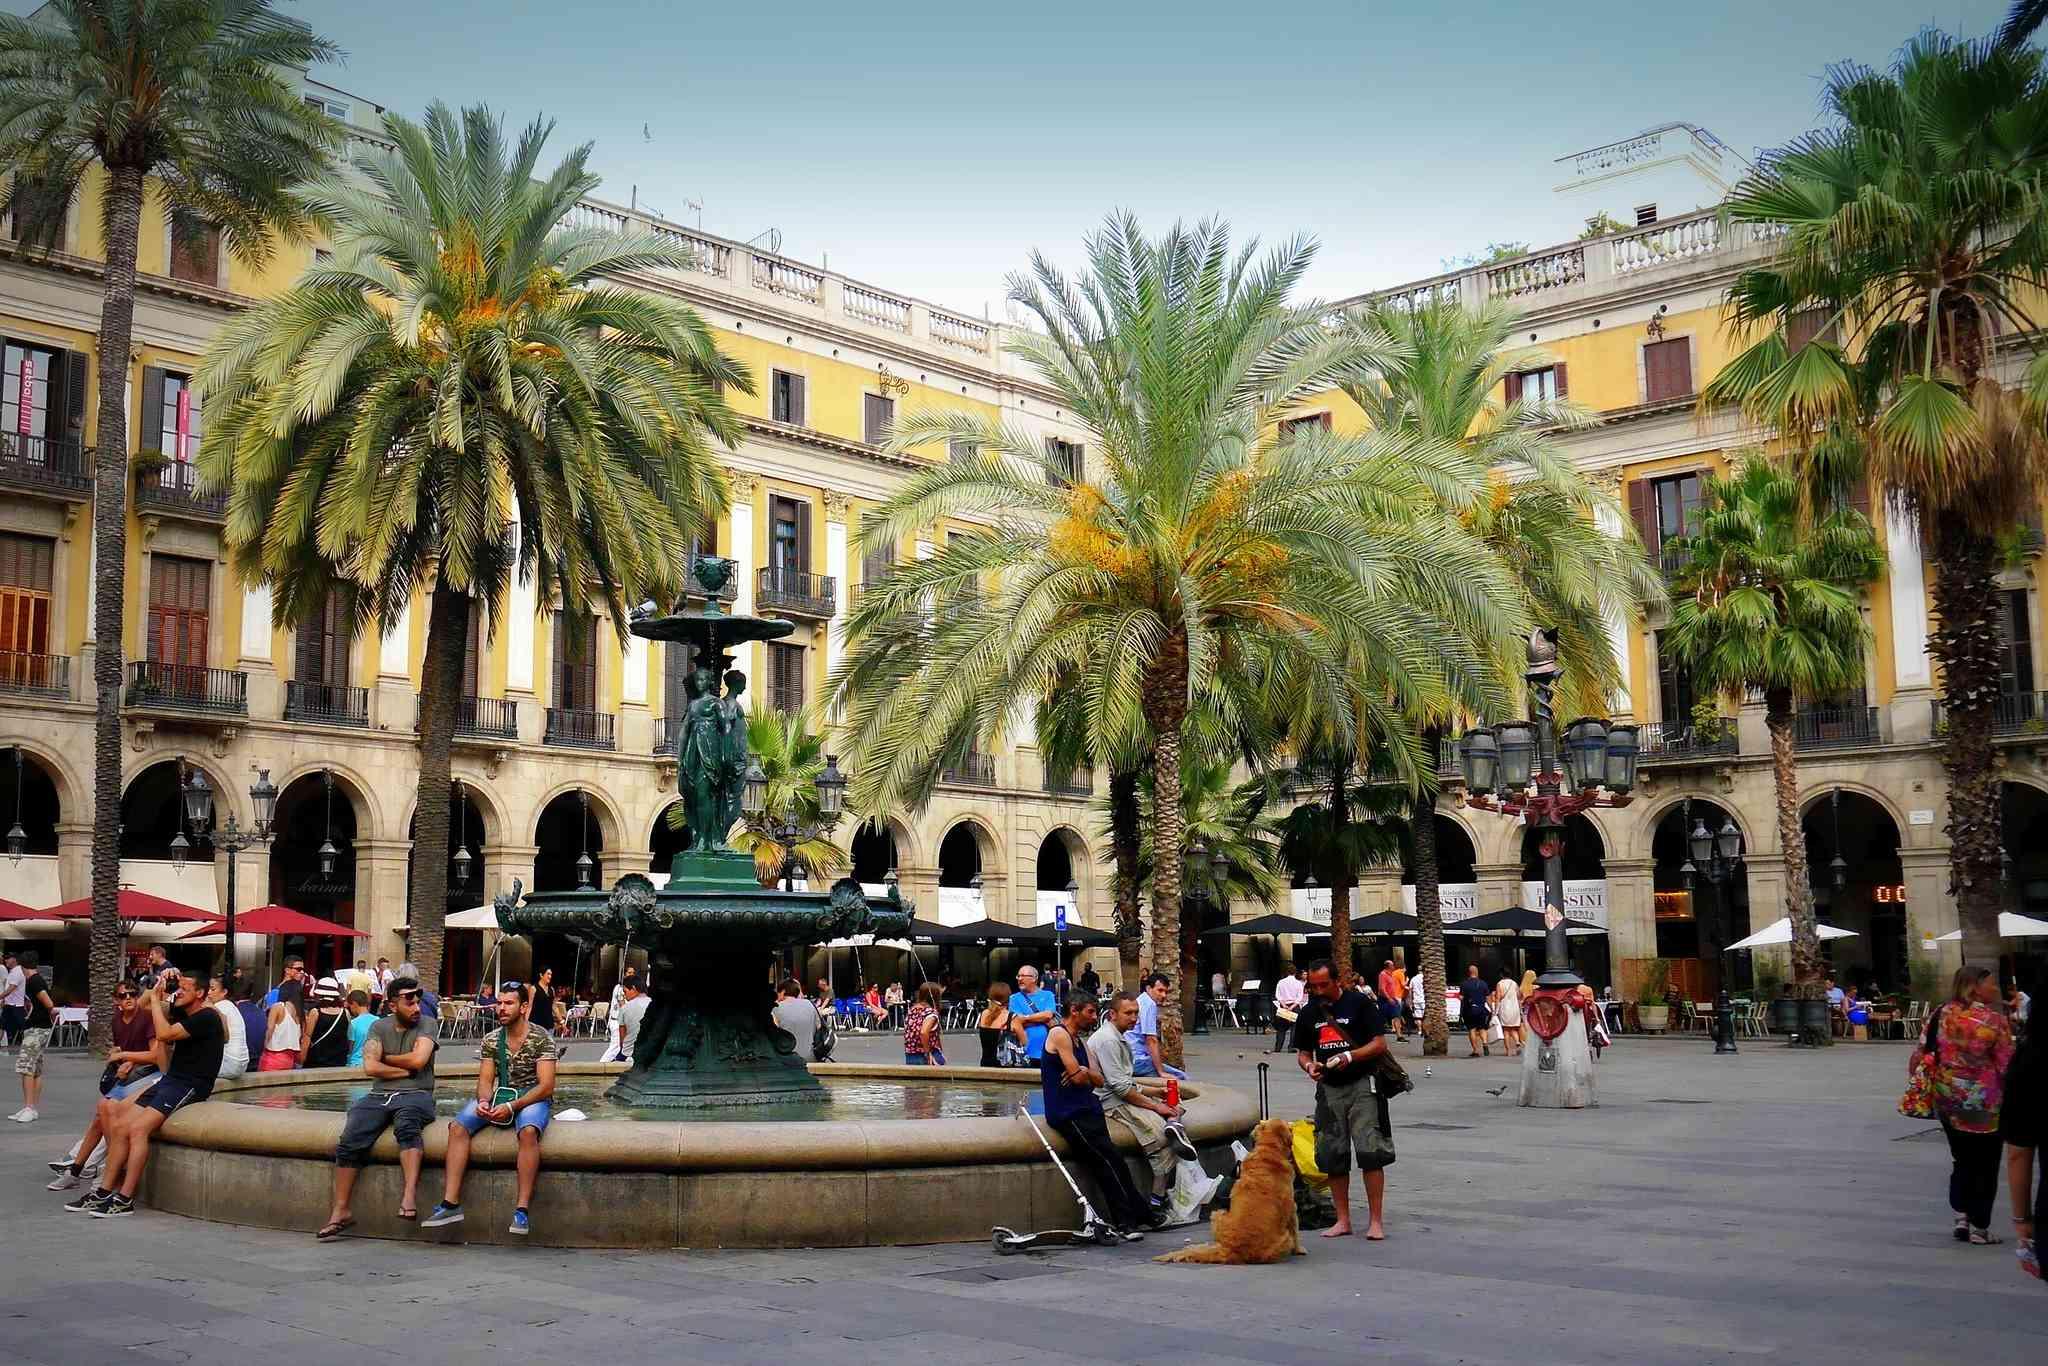 People sitting around fountain in Plaça Reial, Barcelona